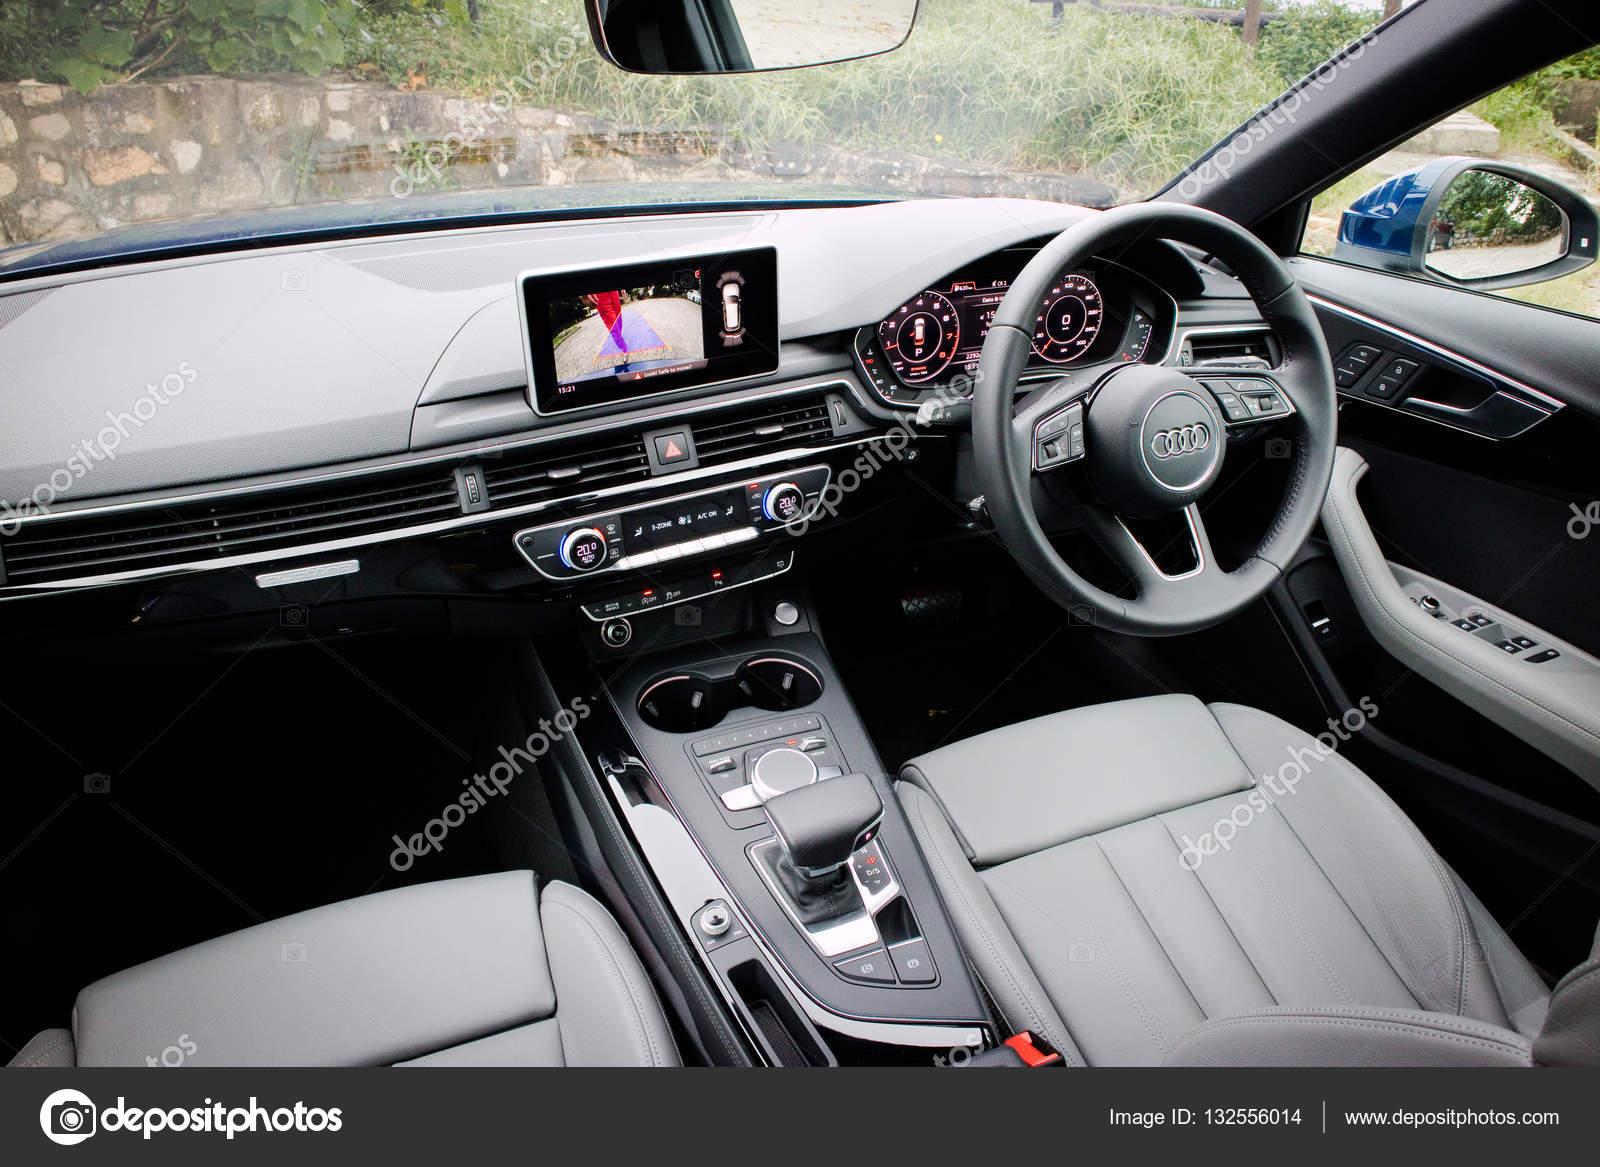 Audi A4 Avant 45 TFSI quattro Interior — Redaktionelles Stockfoto ...